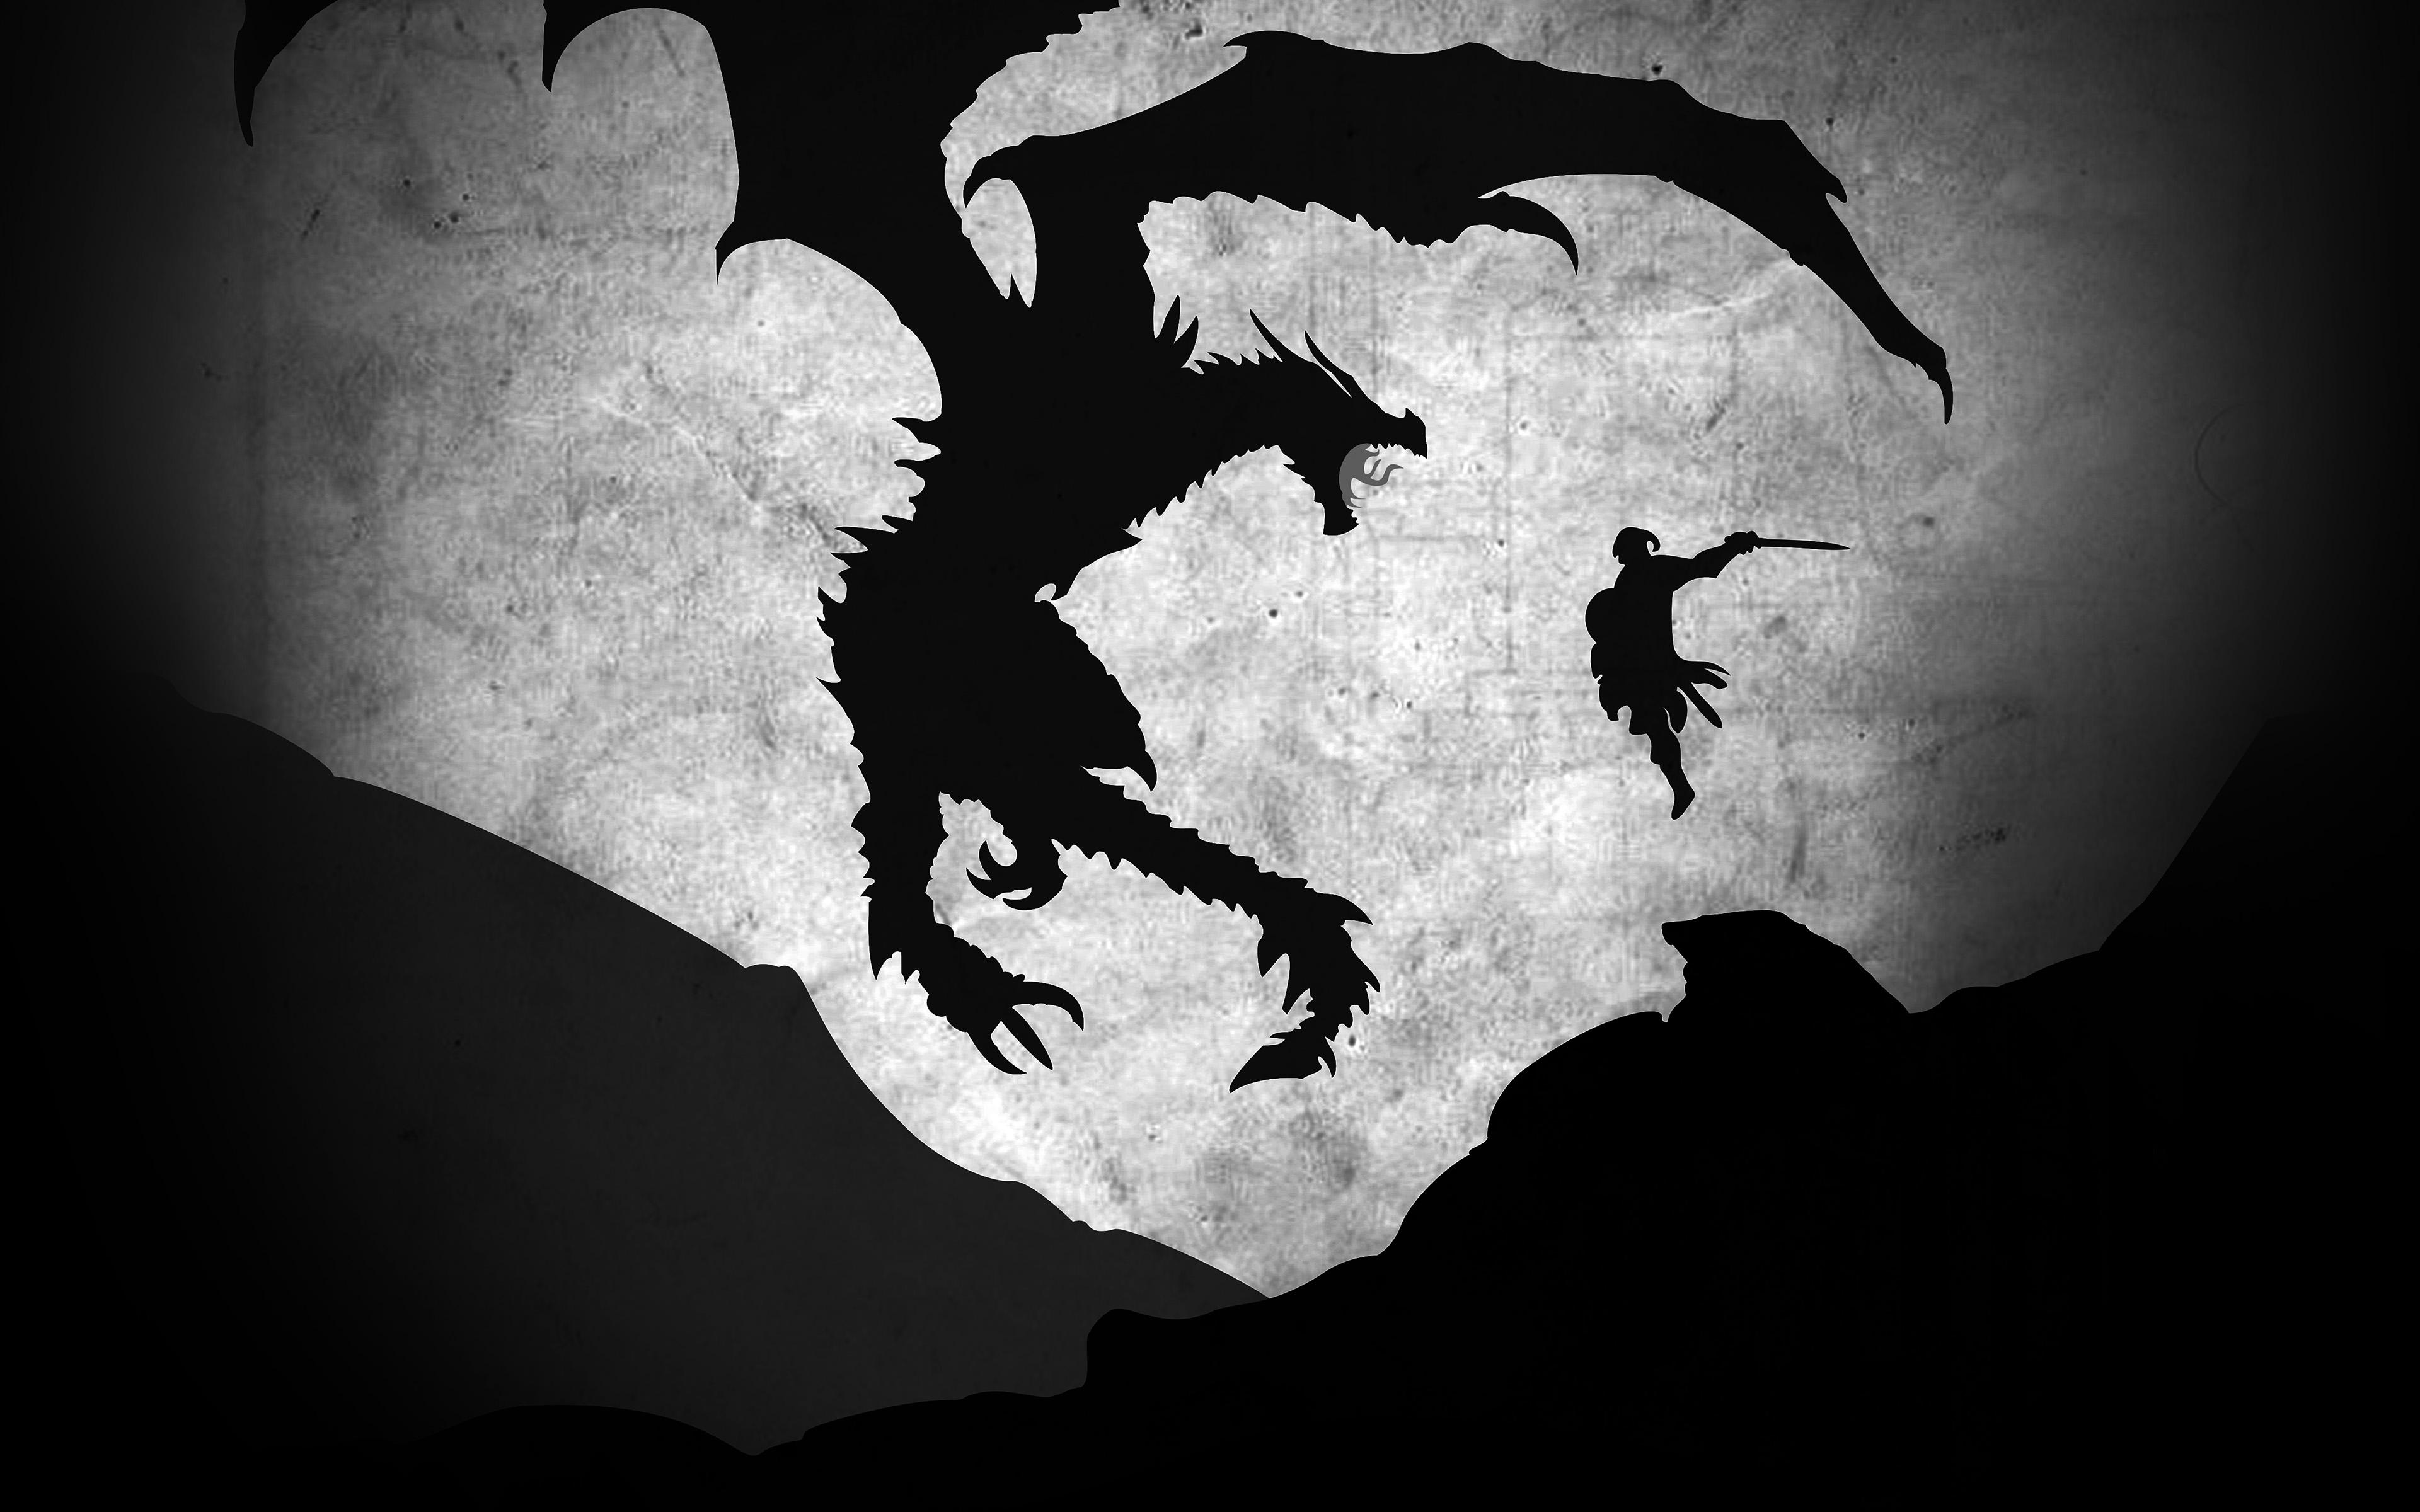 Skyrim Fall Wallpaper Hd Au58 Skyrim Dragon Illustration Art Bw Wallpaper